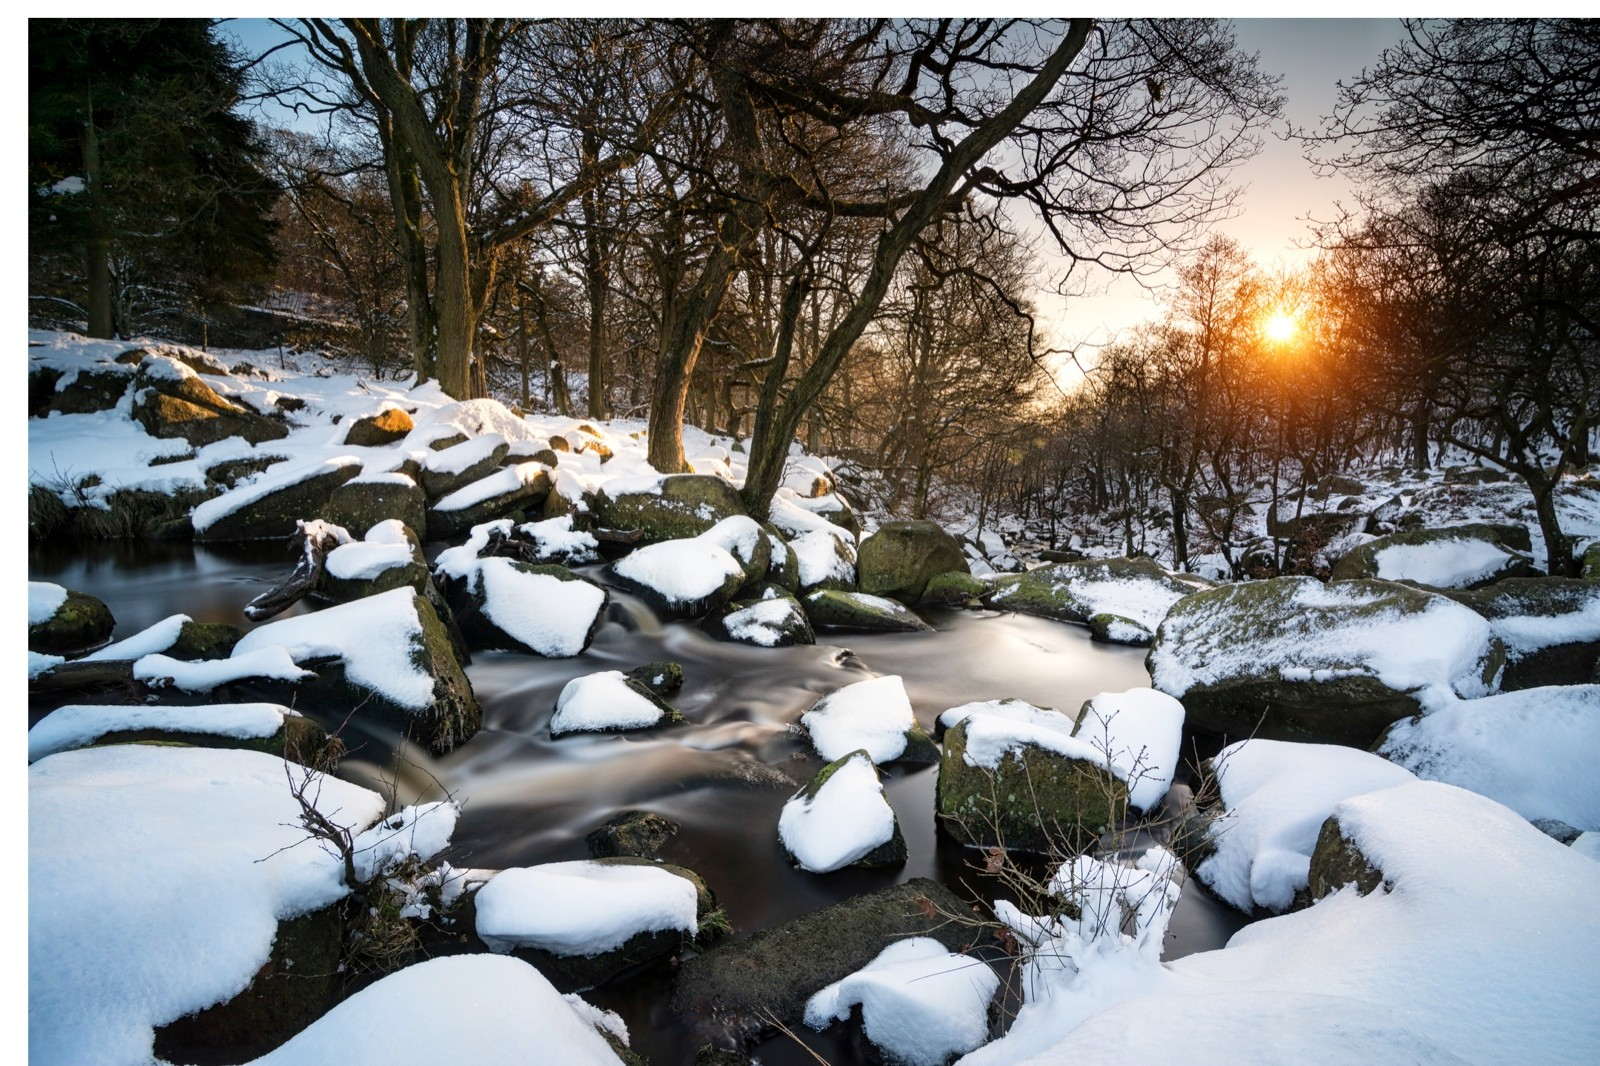 Padley-Gorge-in-snow-daf3956